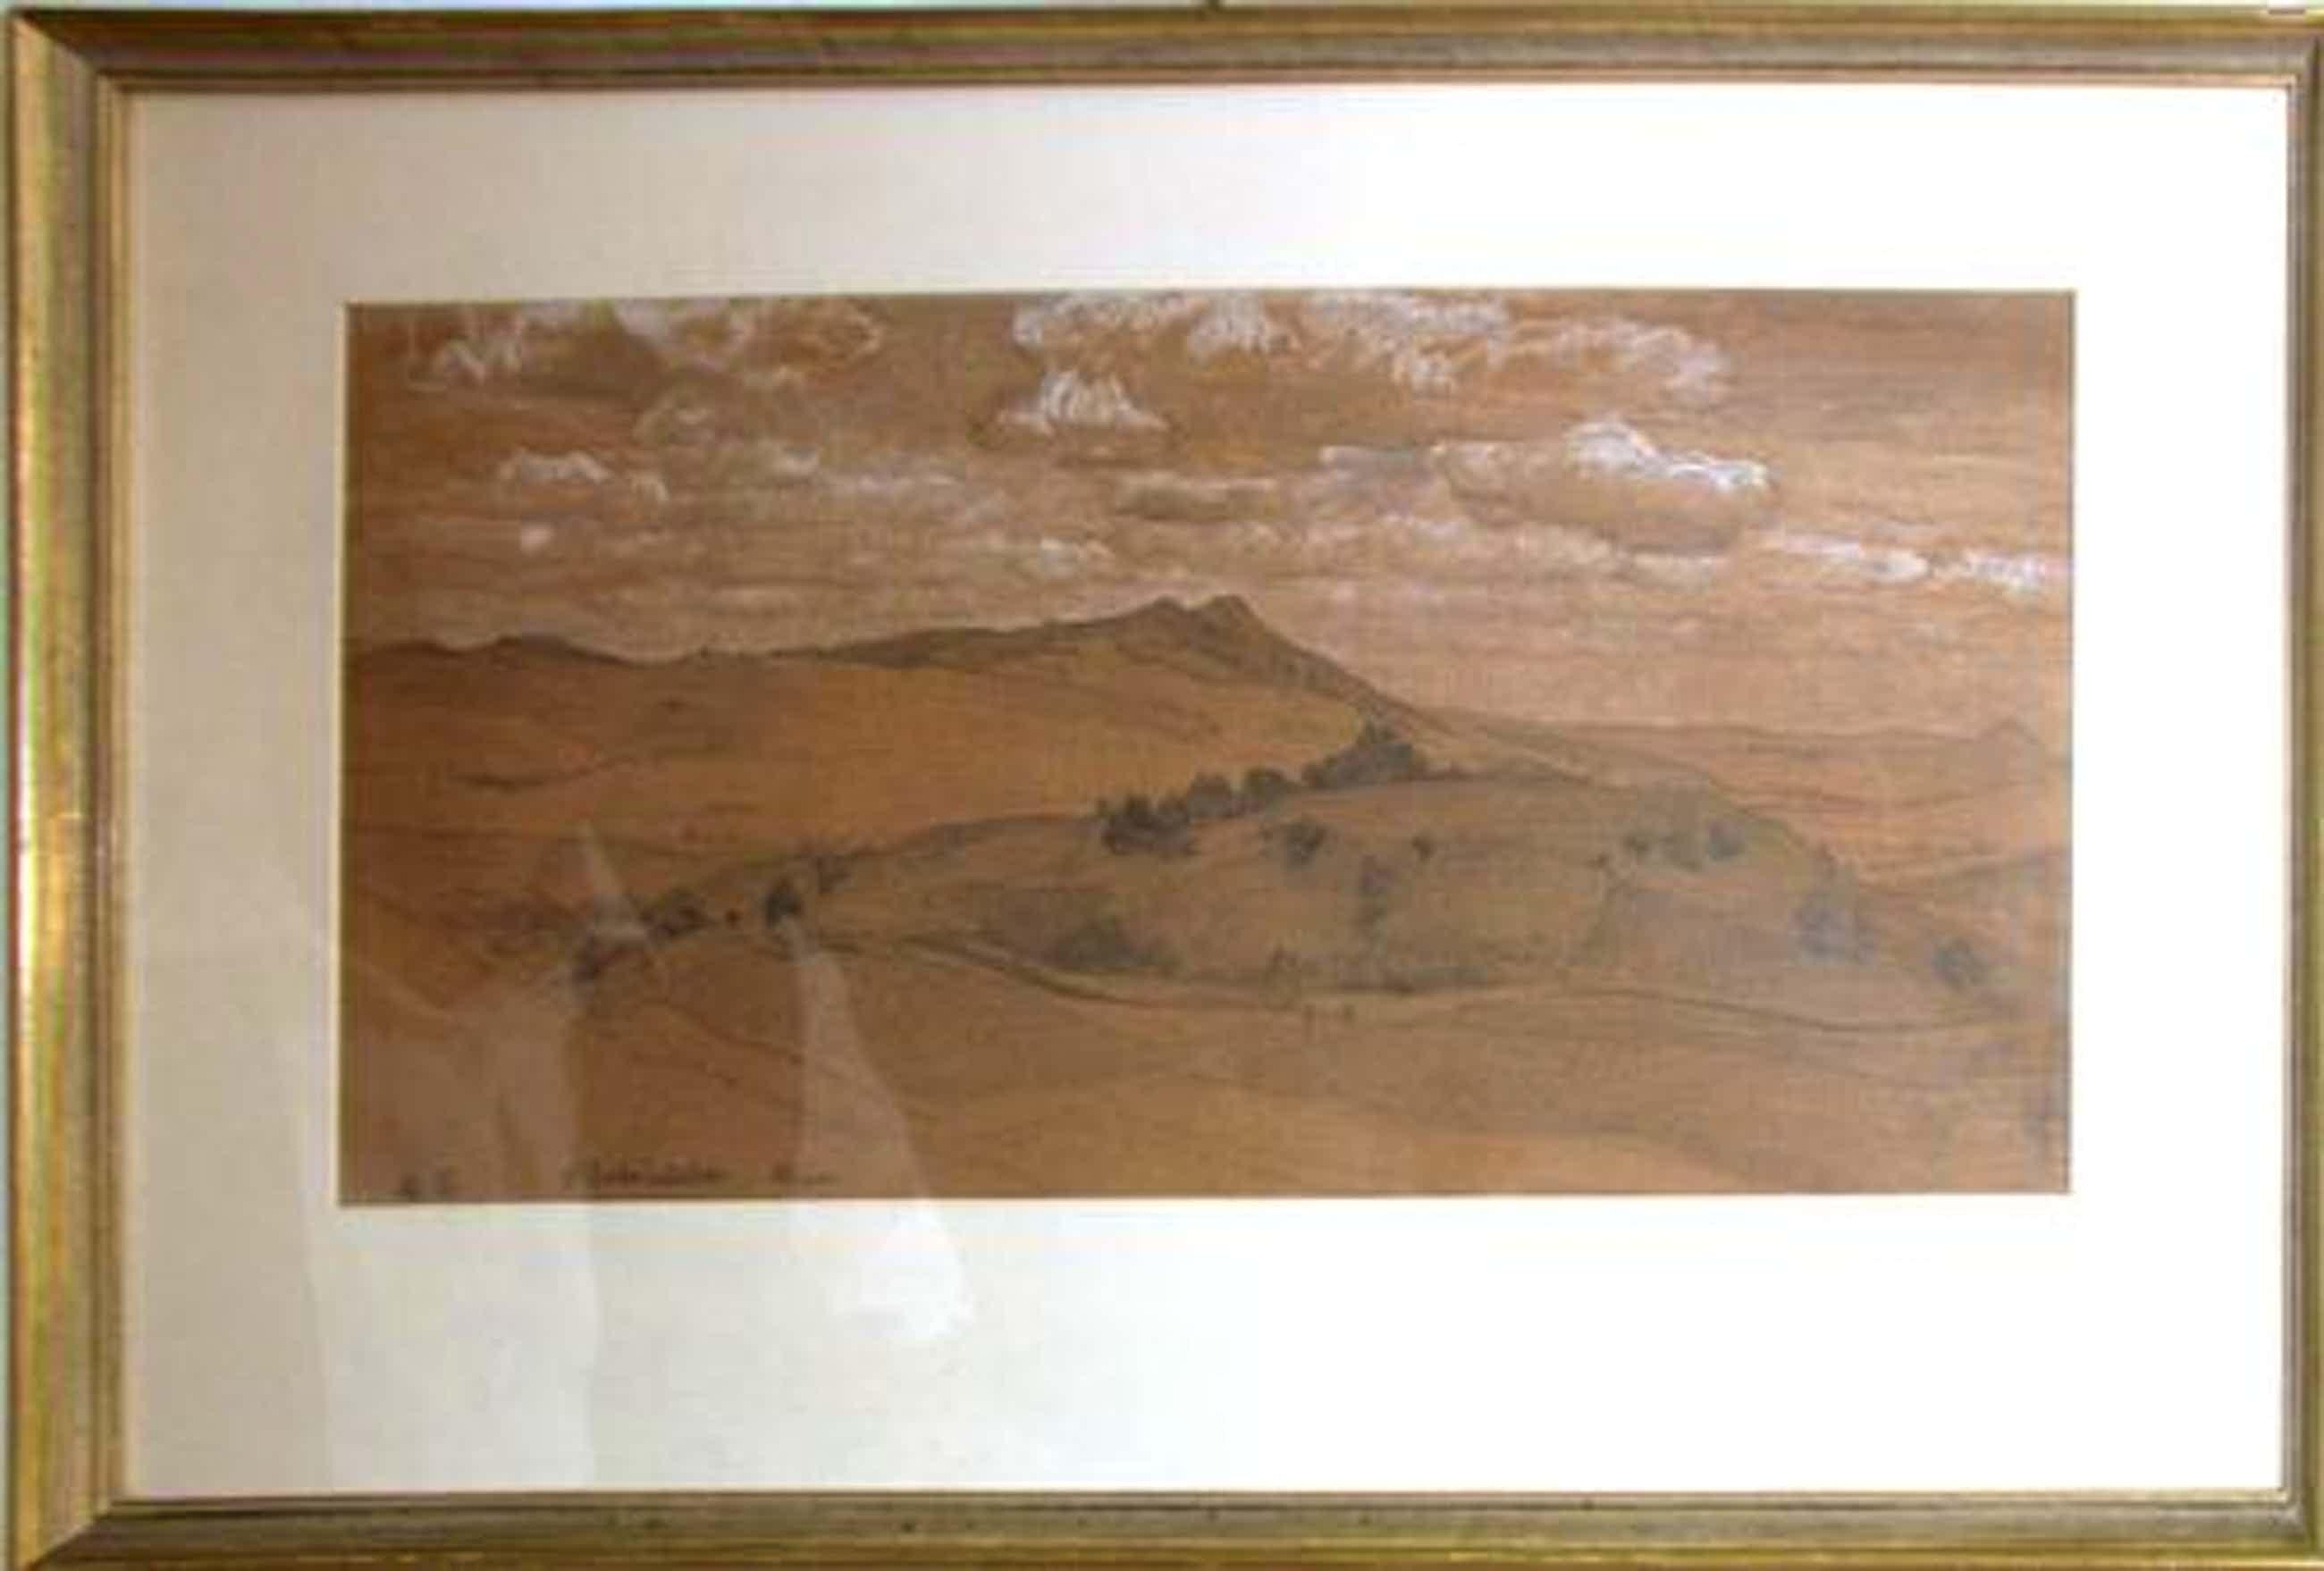 Gustav Schönleber - Hügelige Landschaft original arbeit auf papier kopen? Bied vanaf 1200!